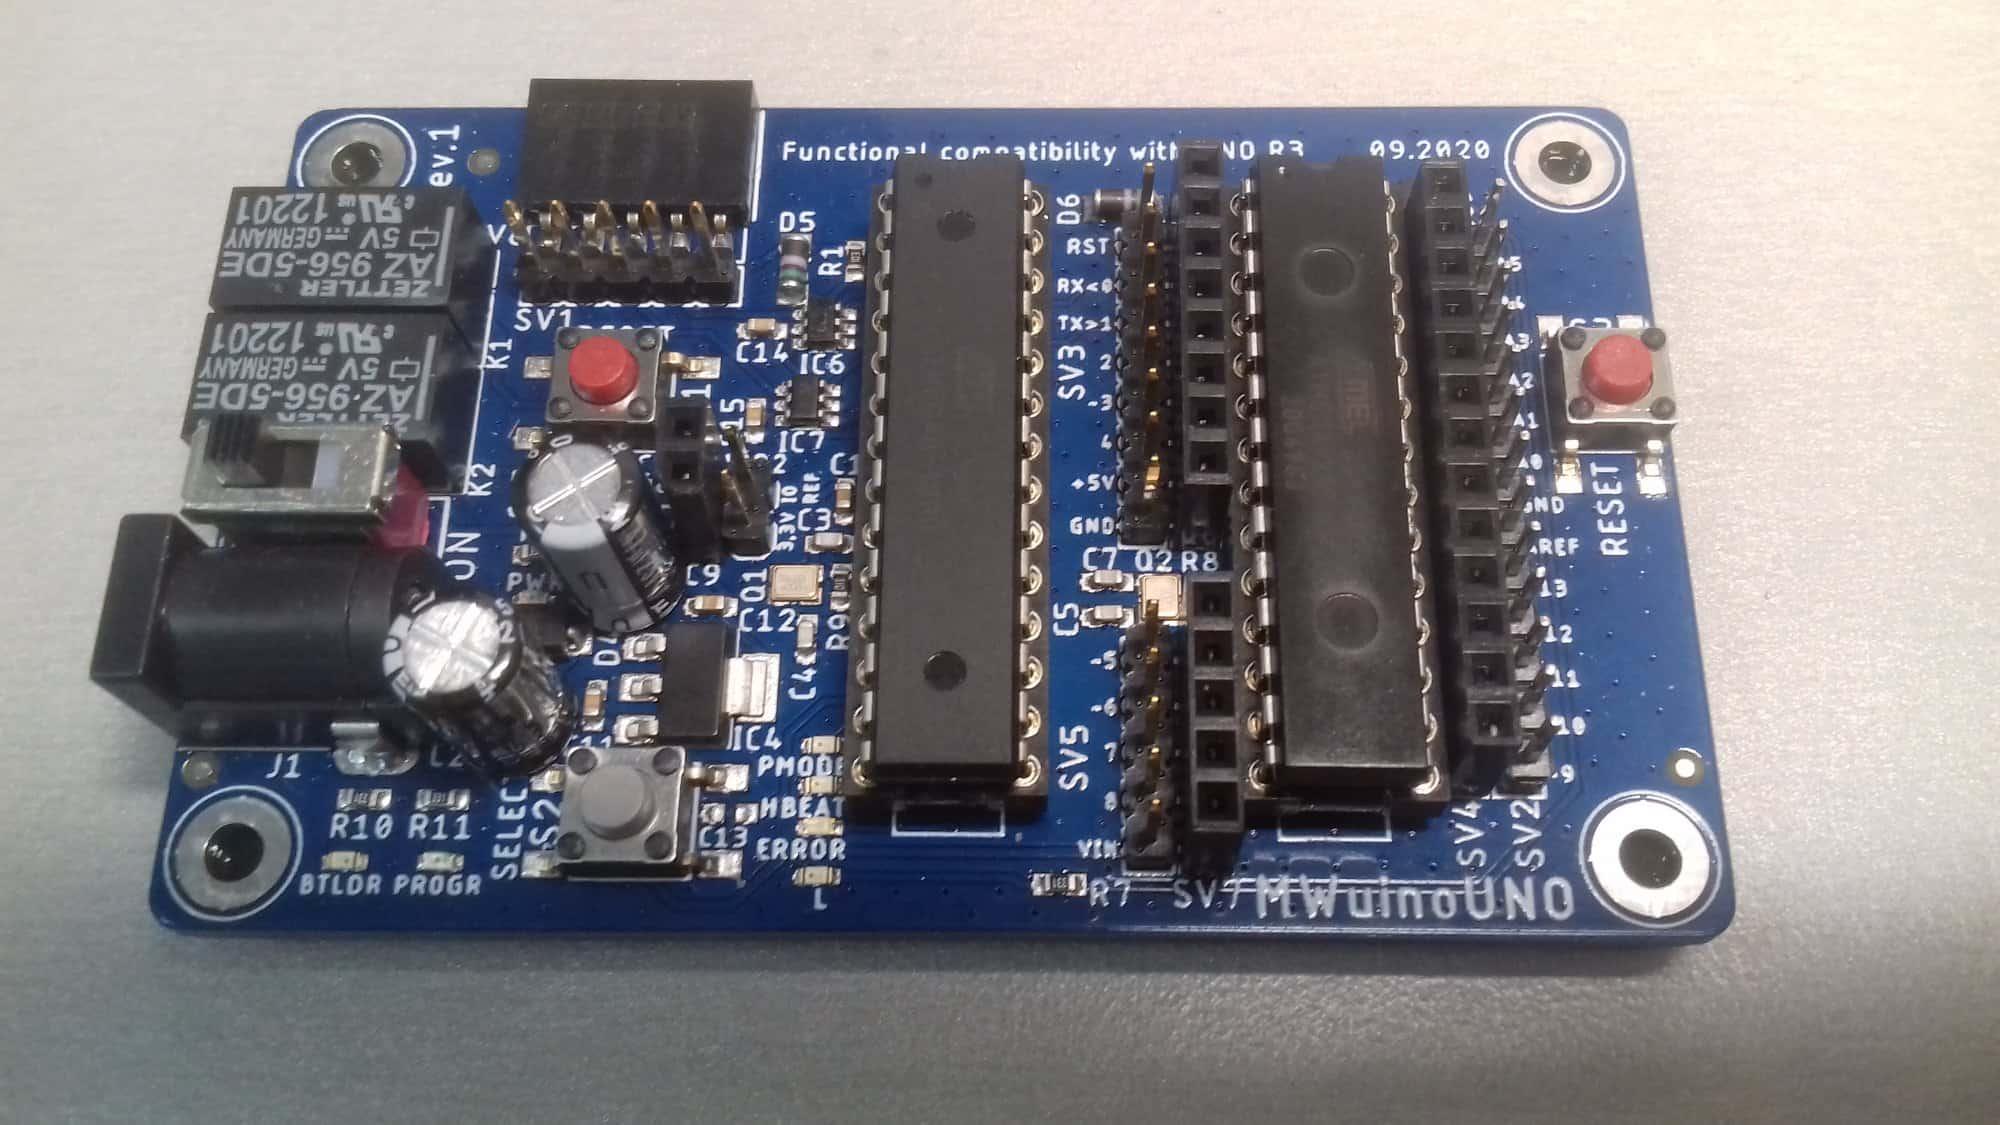 MWuinoUNO-Bootloader programmer i Arduino w jednym!